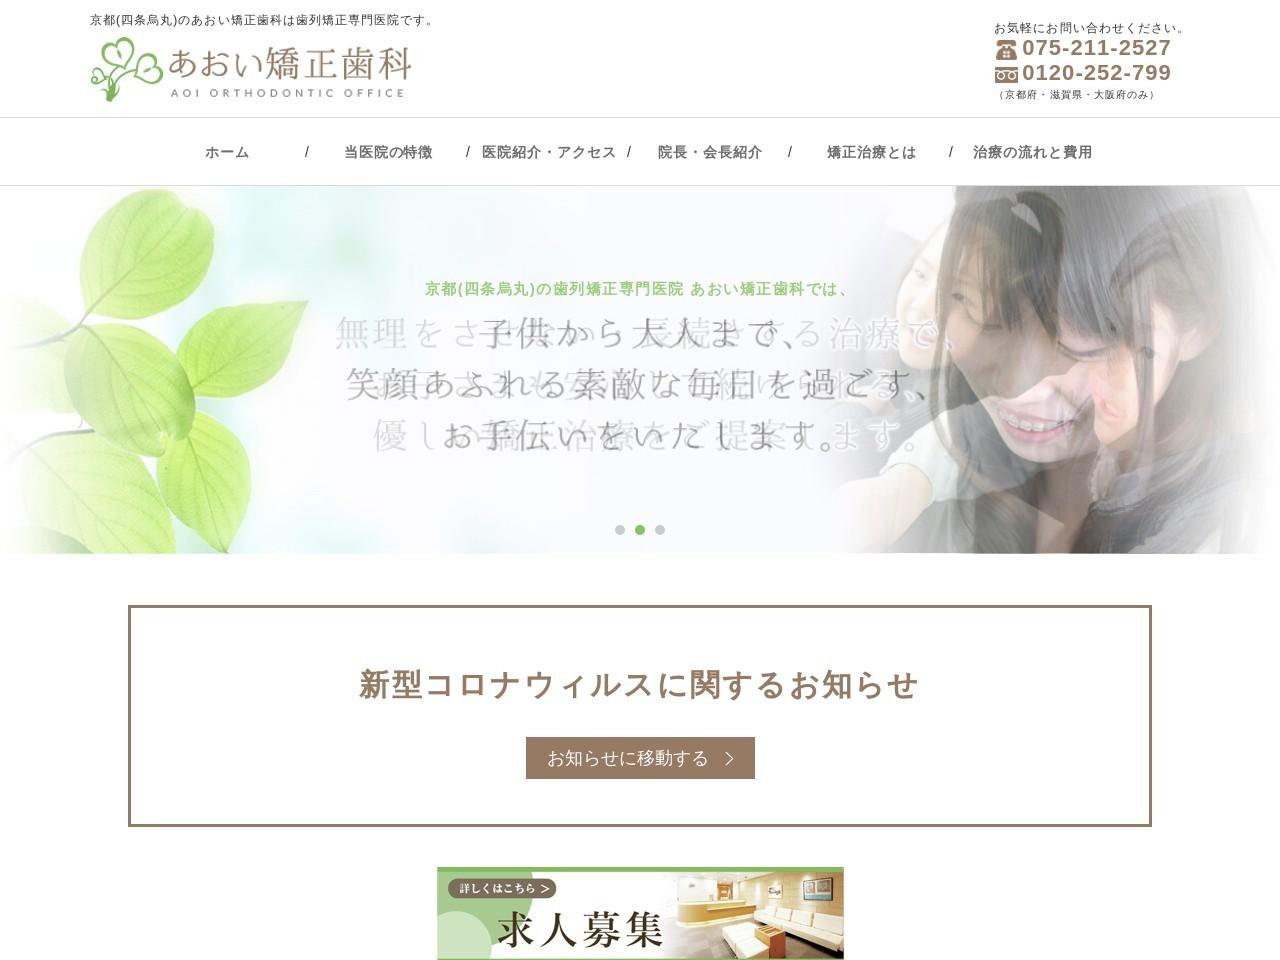 医療法人山脇会  あおい矯正歯科 (京都府京都市下京区)